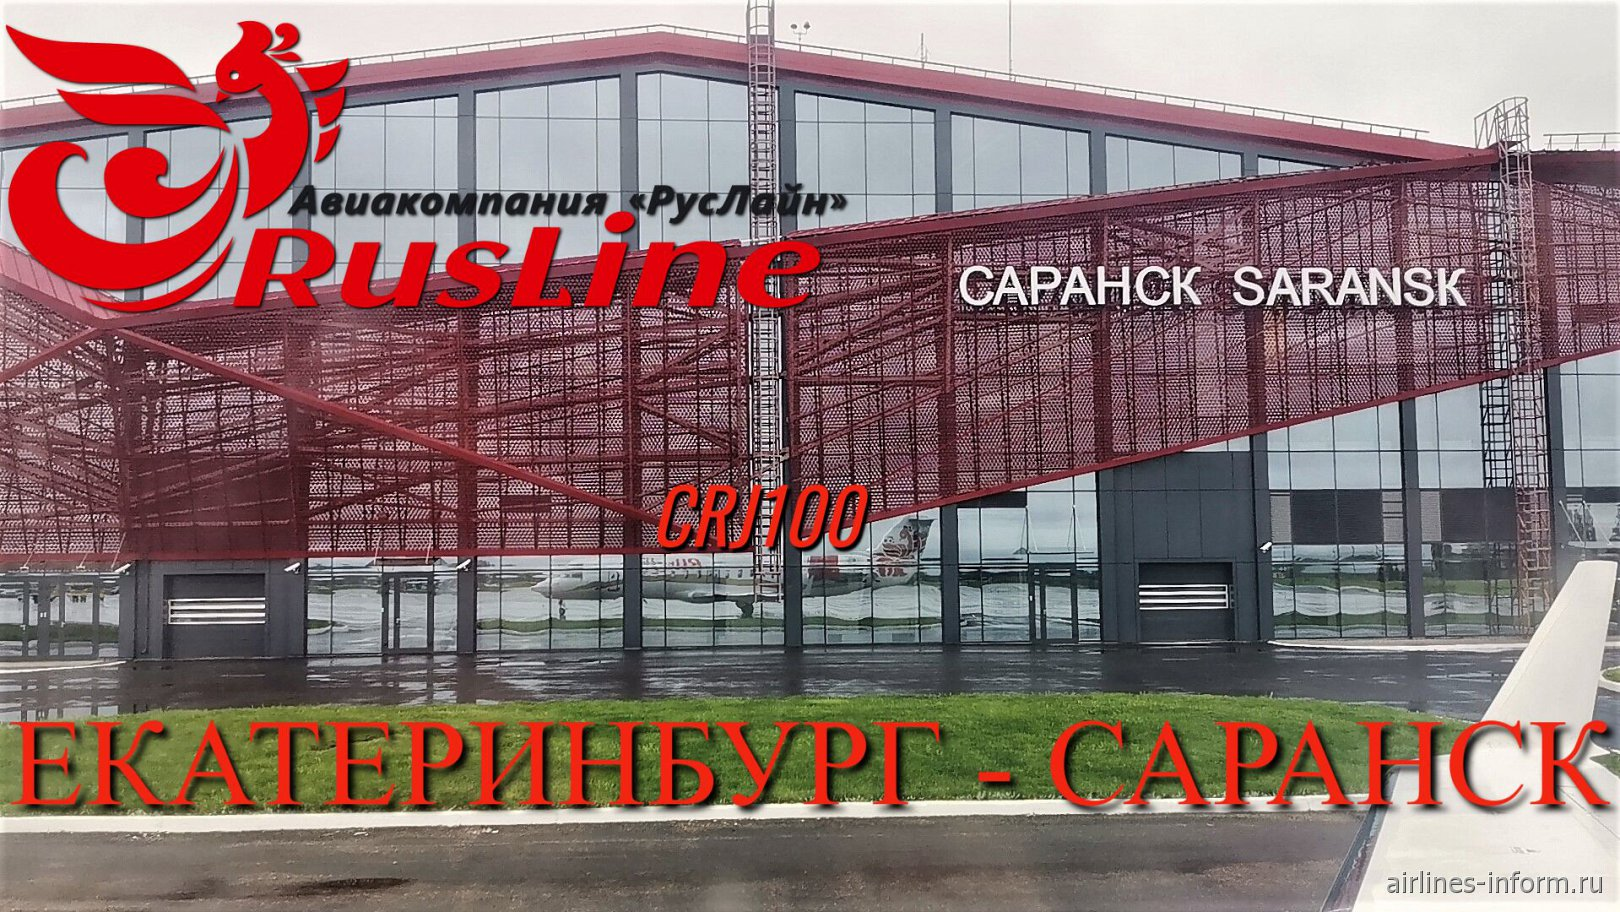 РусЛайн: Екатеринбург - Саранск. Коронавирус